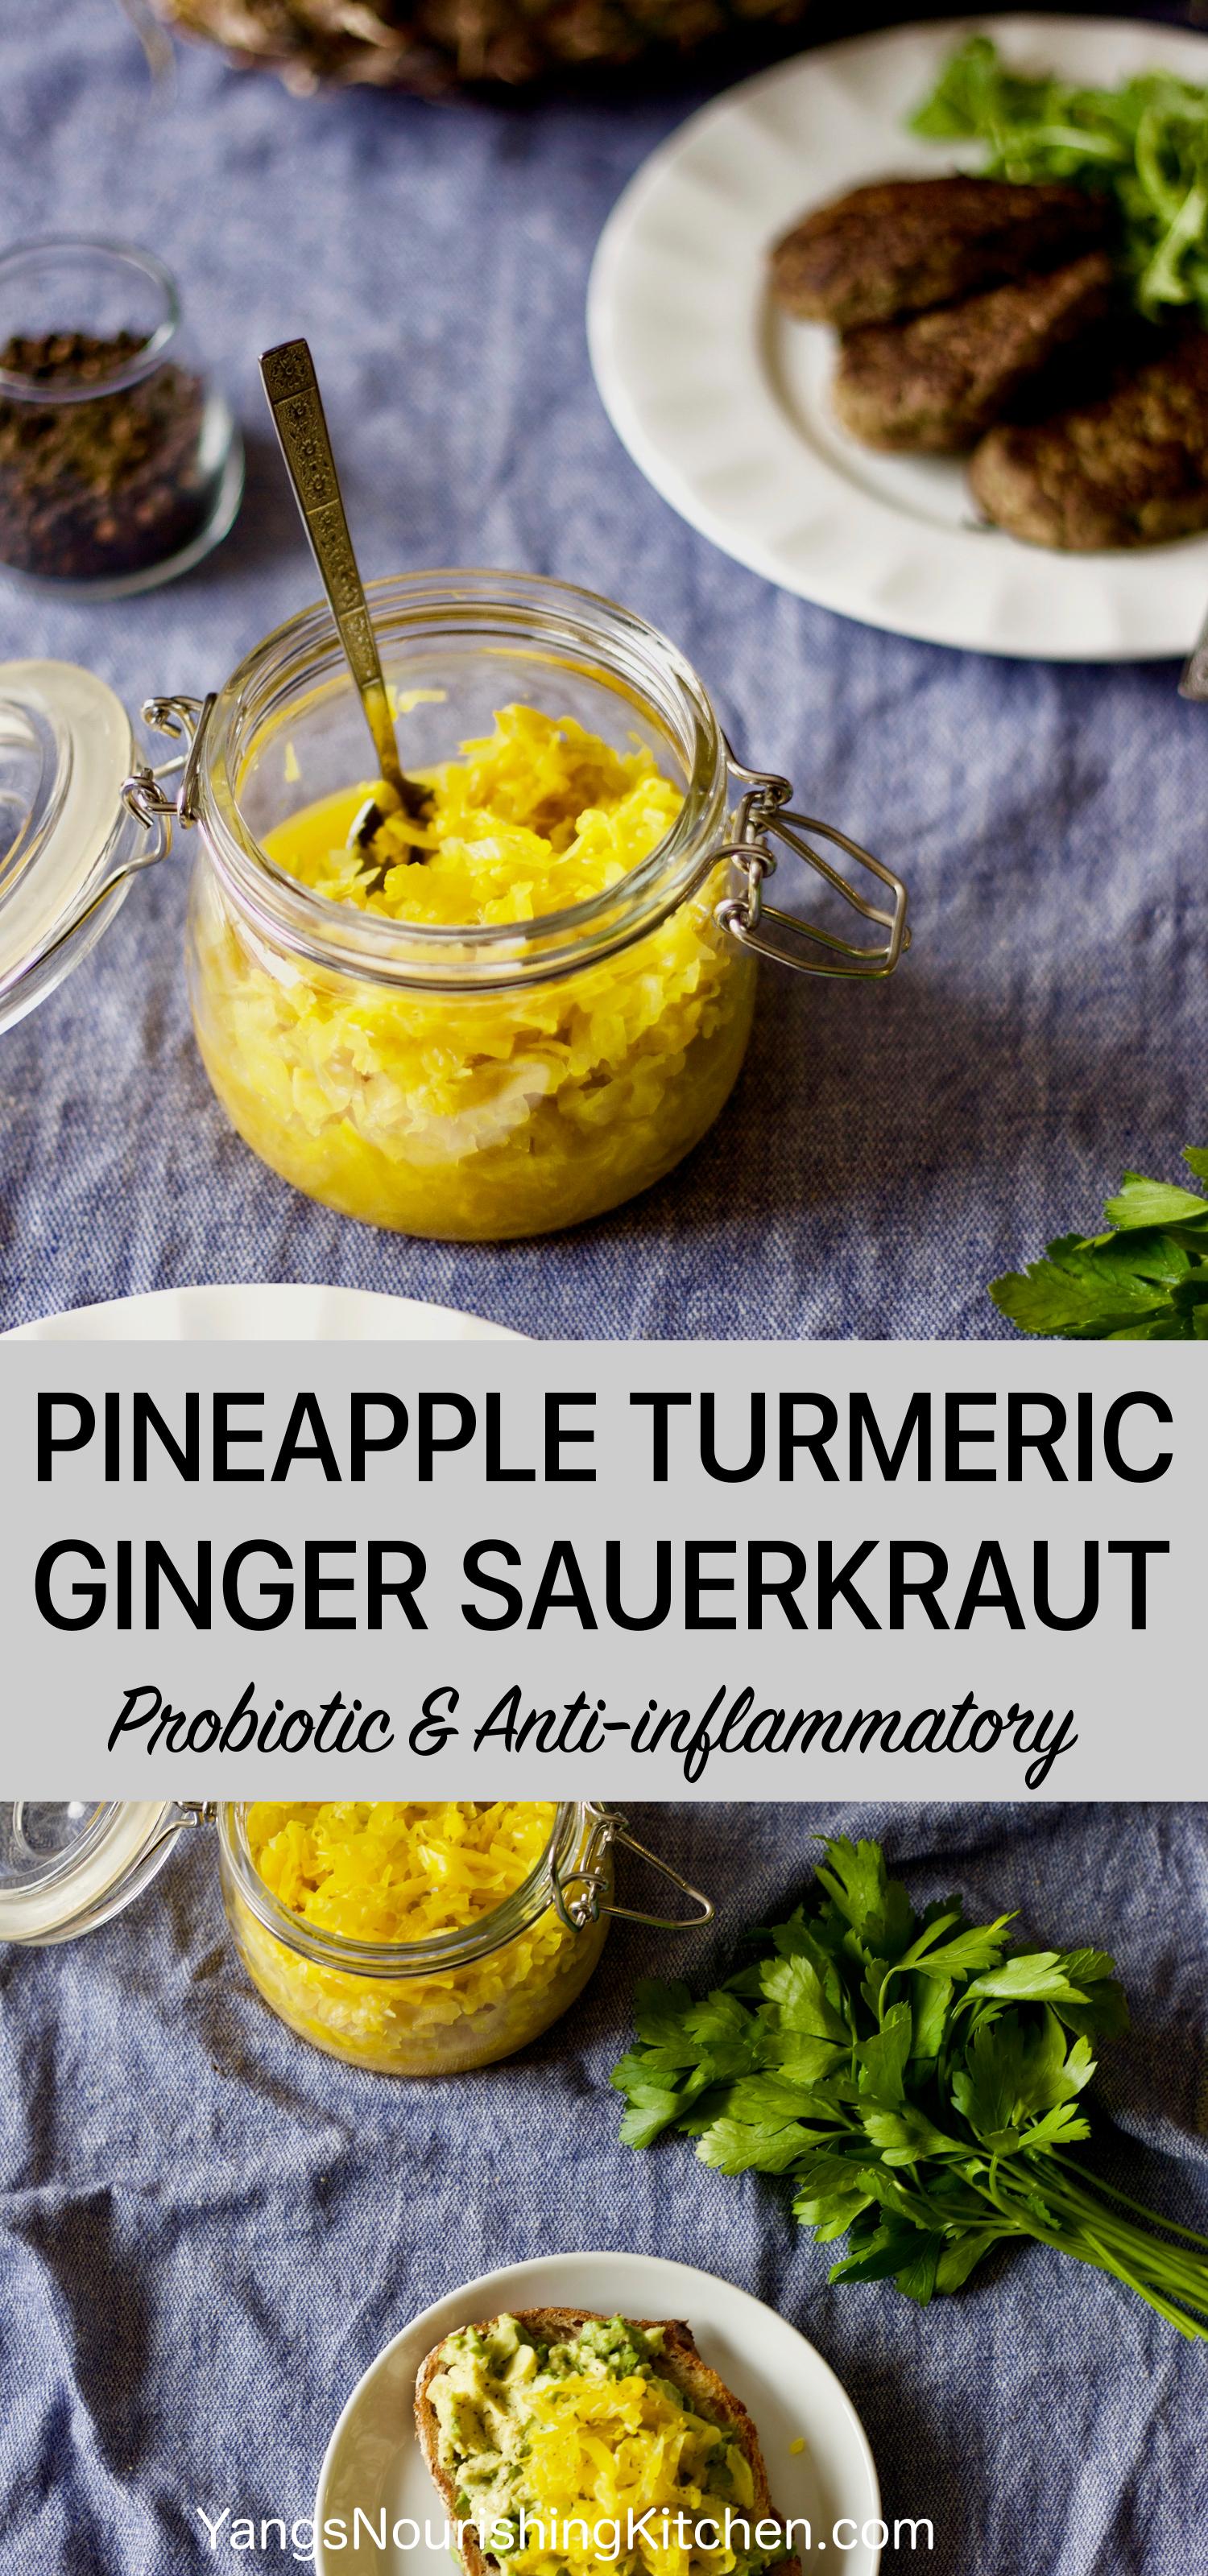 Pineapple-Turmeric-Ginger Probiotic Sauerkraut